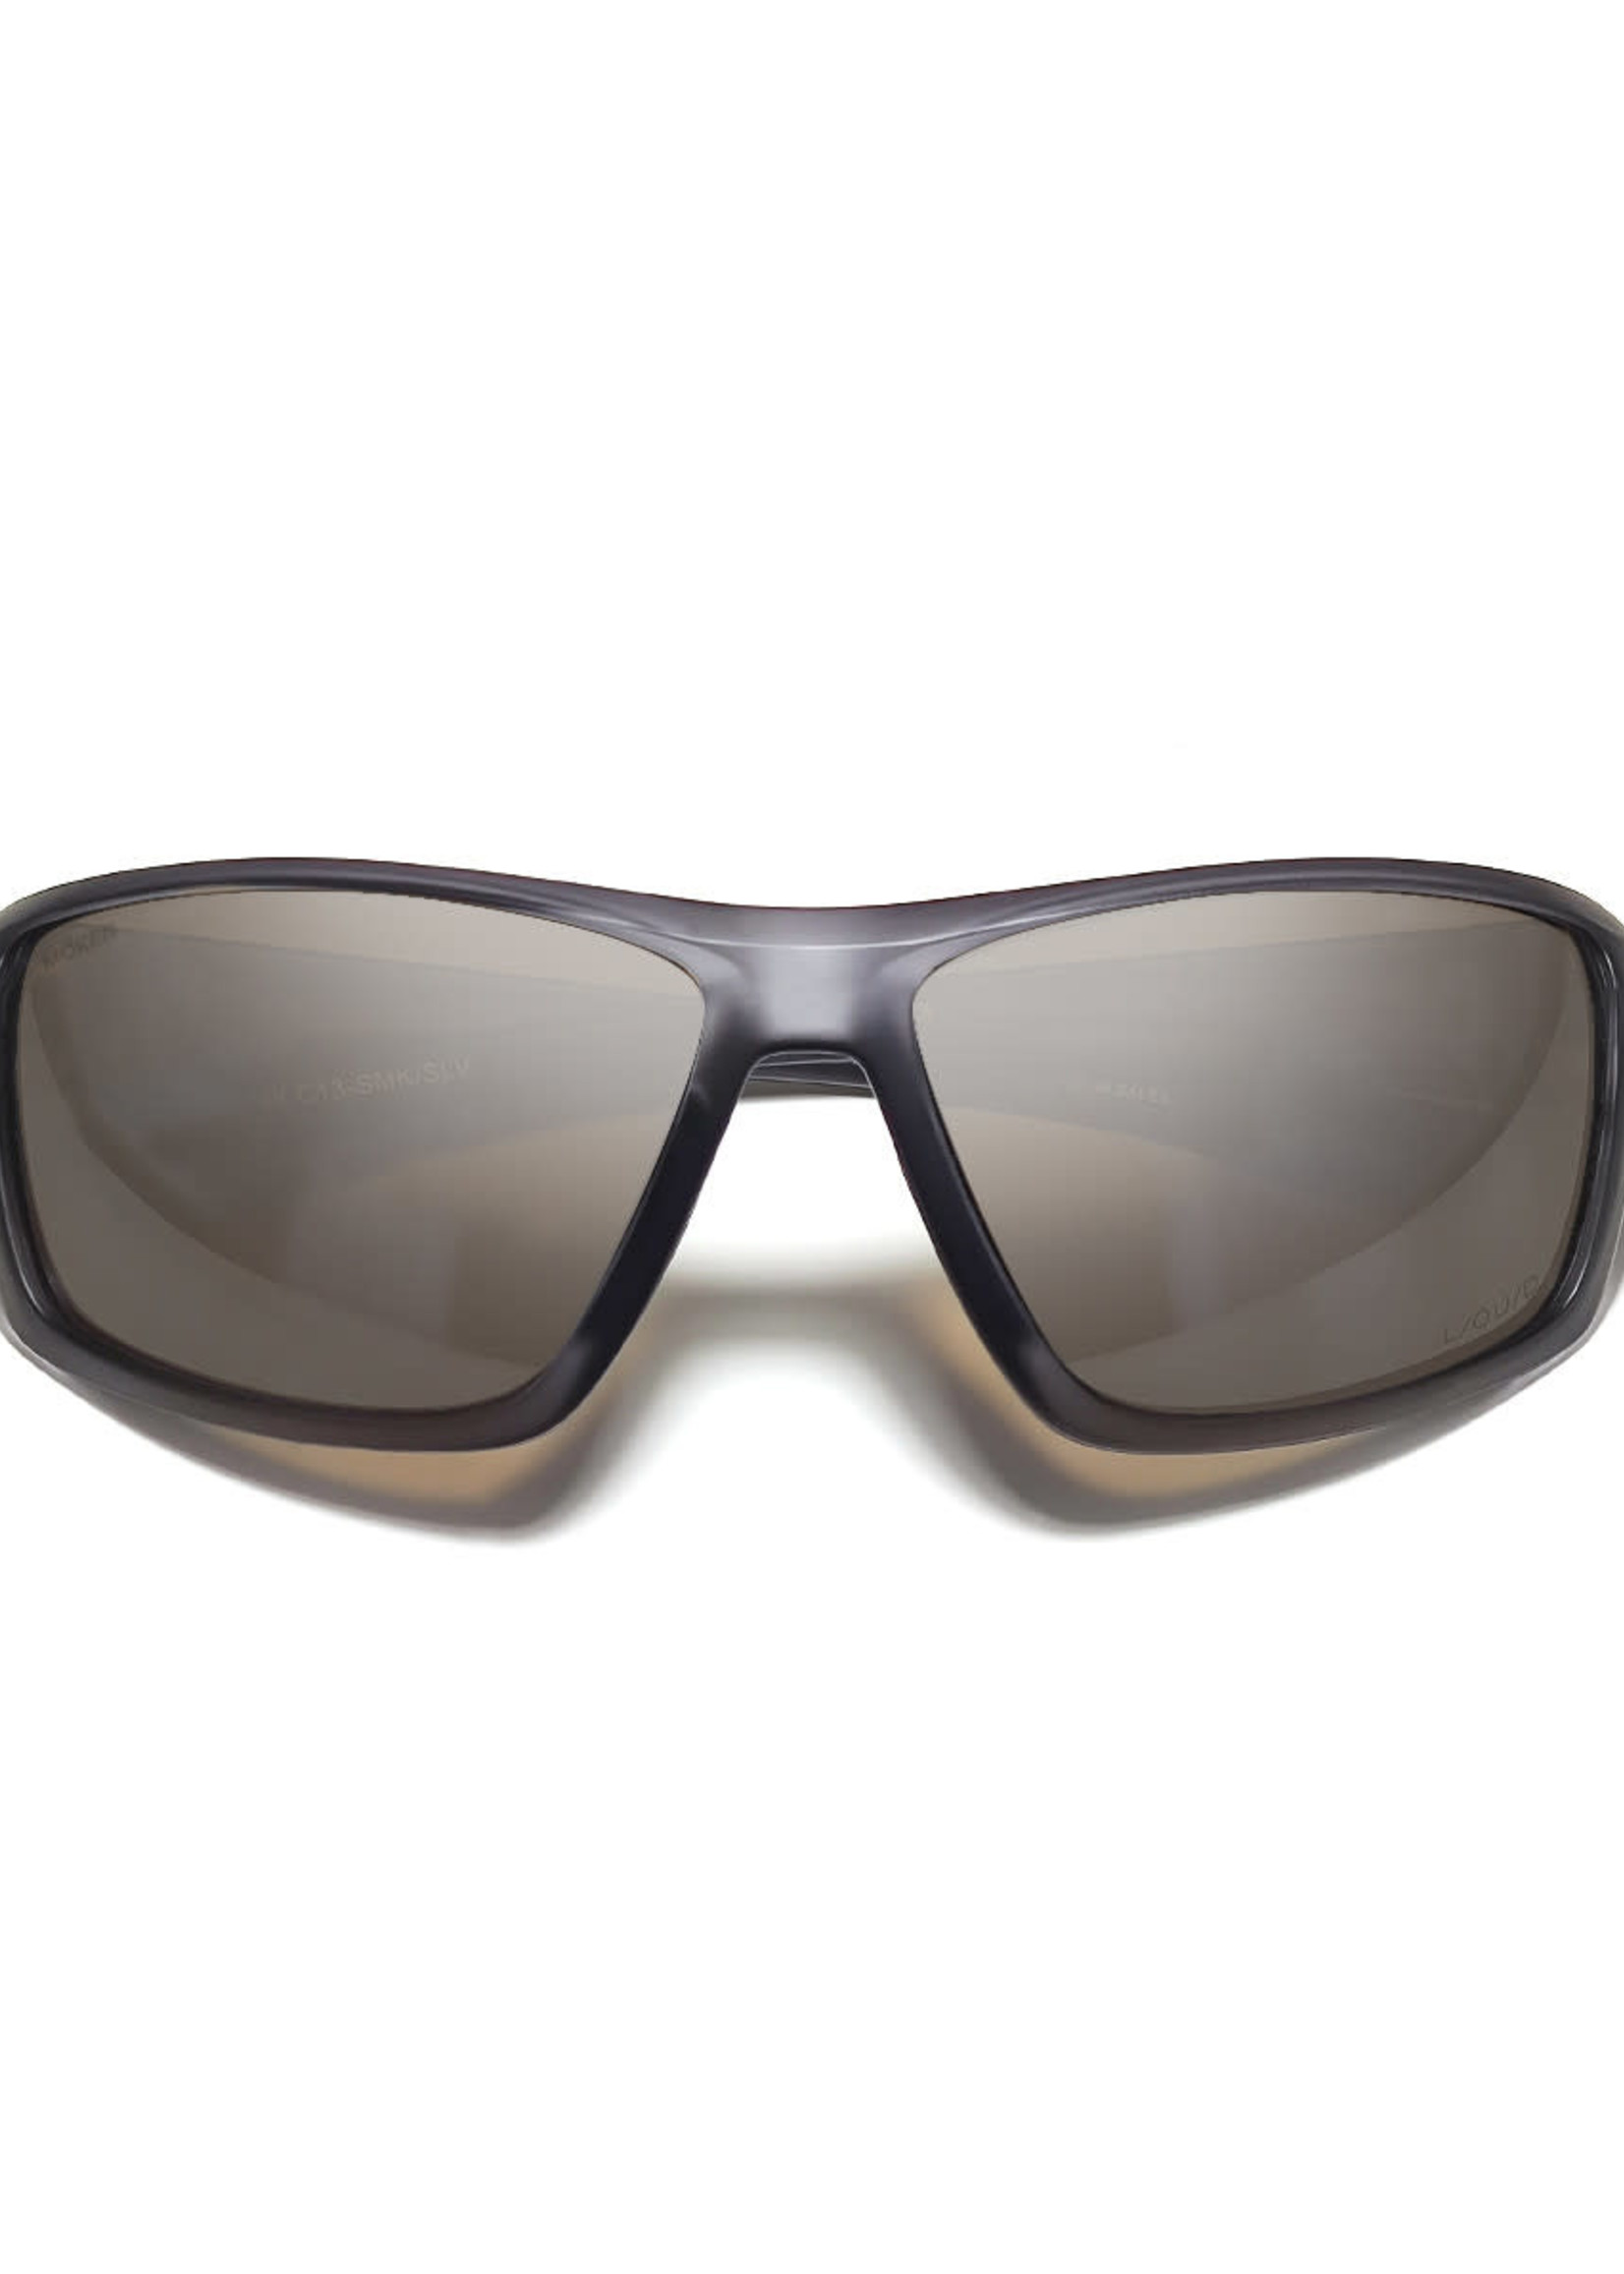 Moken Vision Moken Vision- Skyfoil -Smoke-Grey-Silver